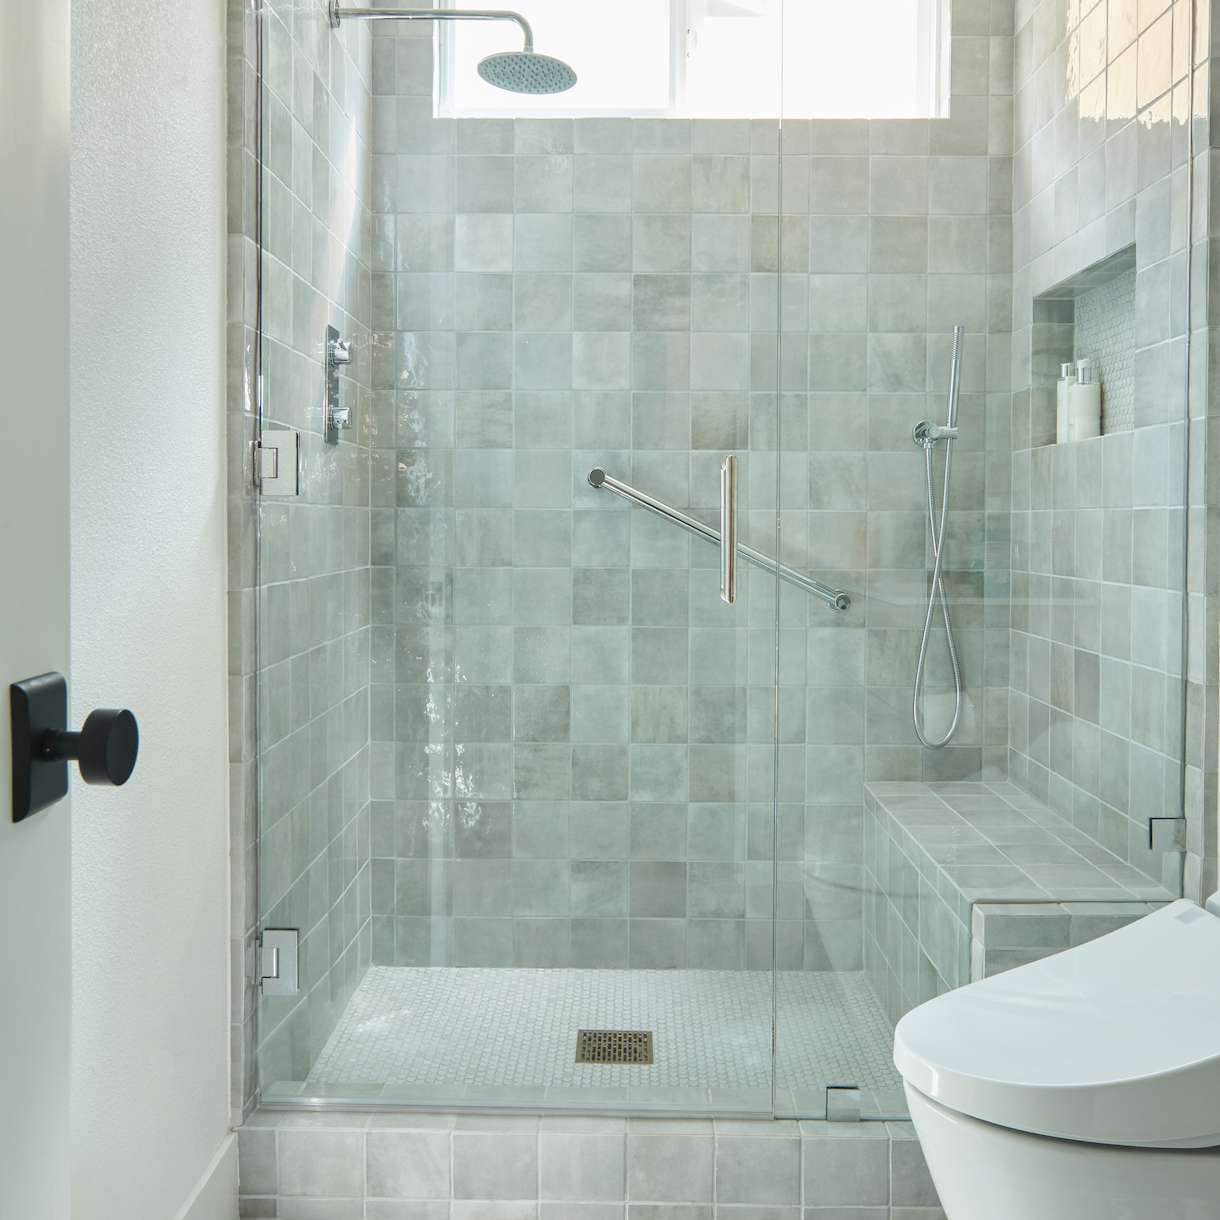 Glass door on a shower